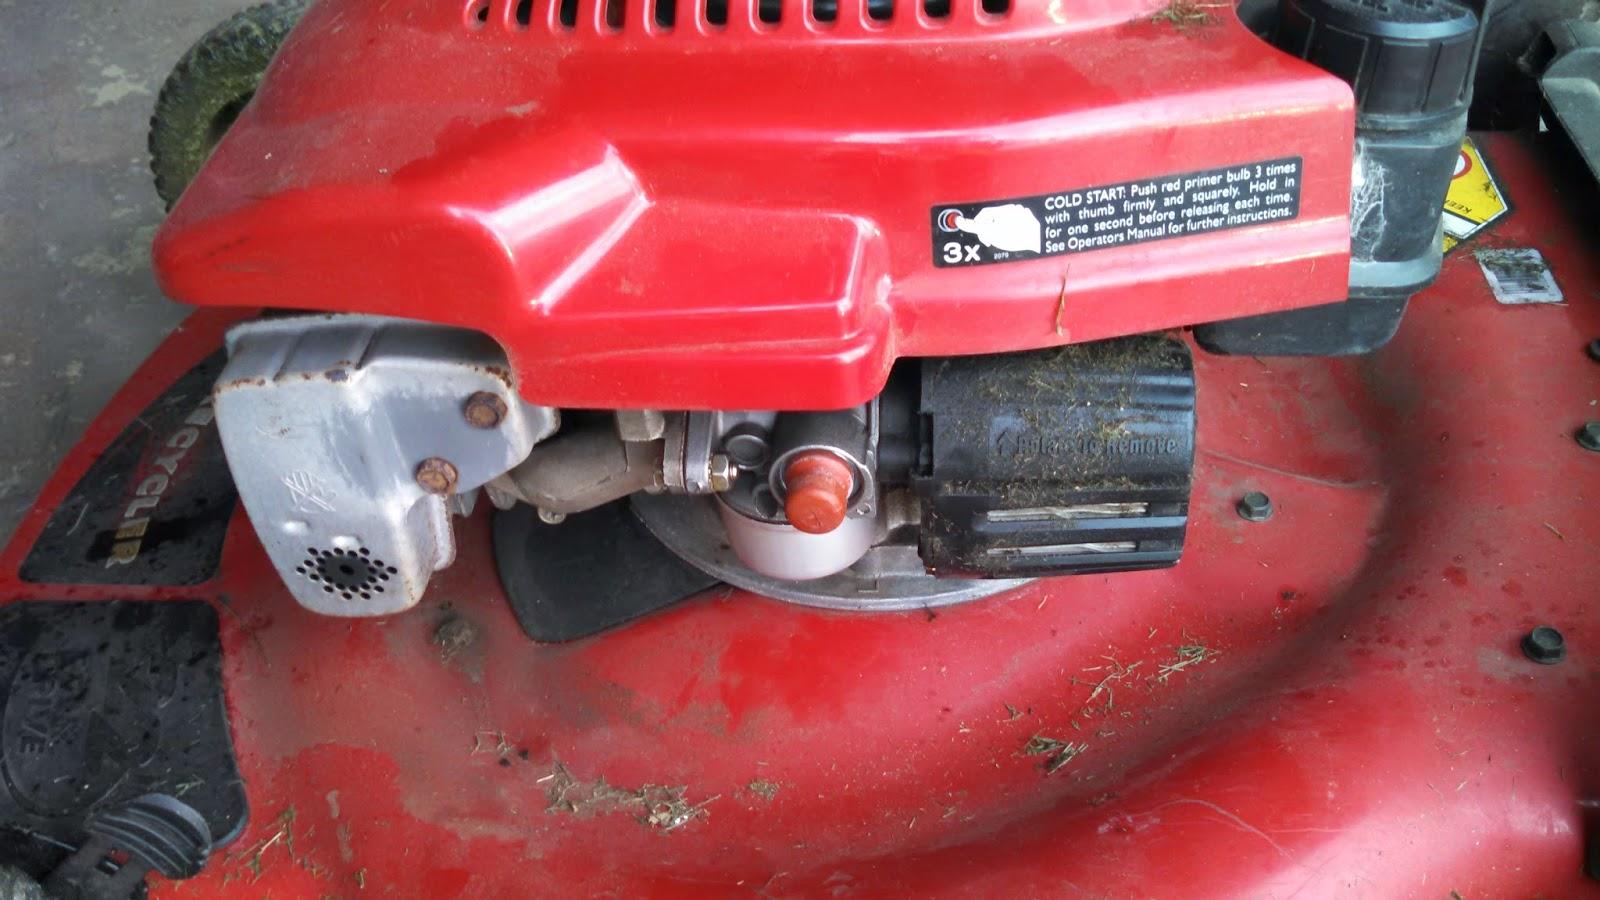 Lawn Mower (Toro) Small Engine Help Needed | Adventure Rider